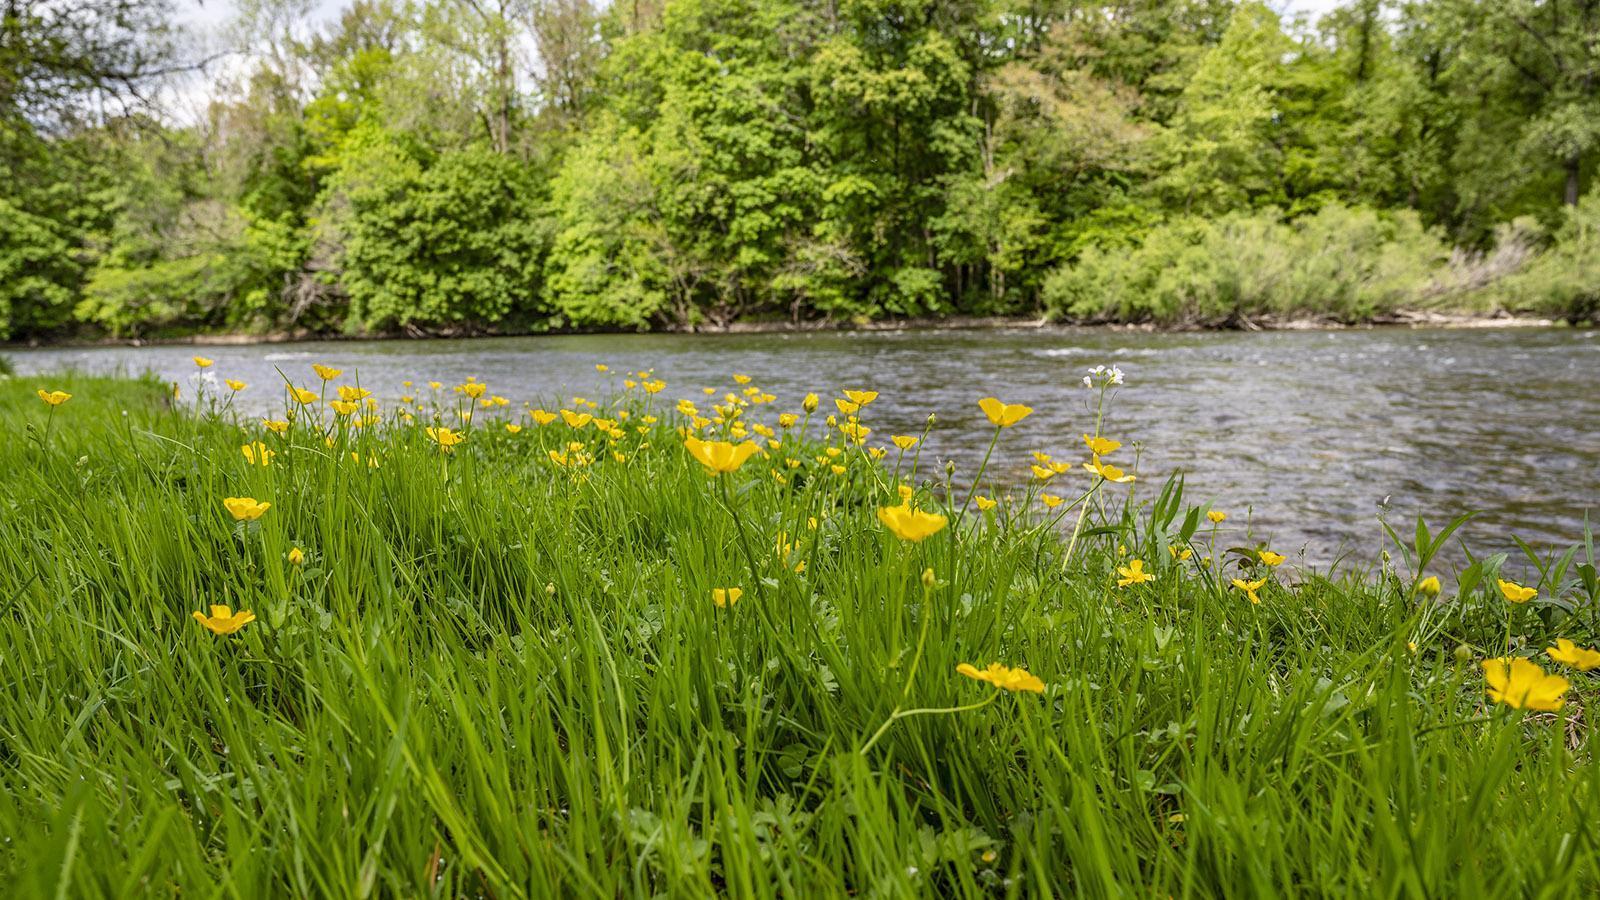 Butterblumen blühem am Ufer der Dordogne. Foto: Hilke Maunder